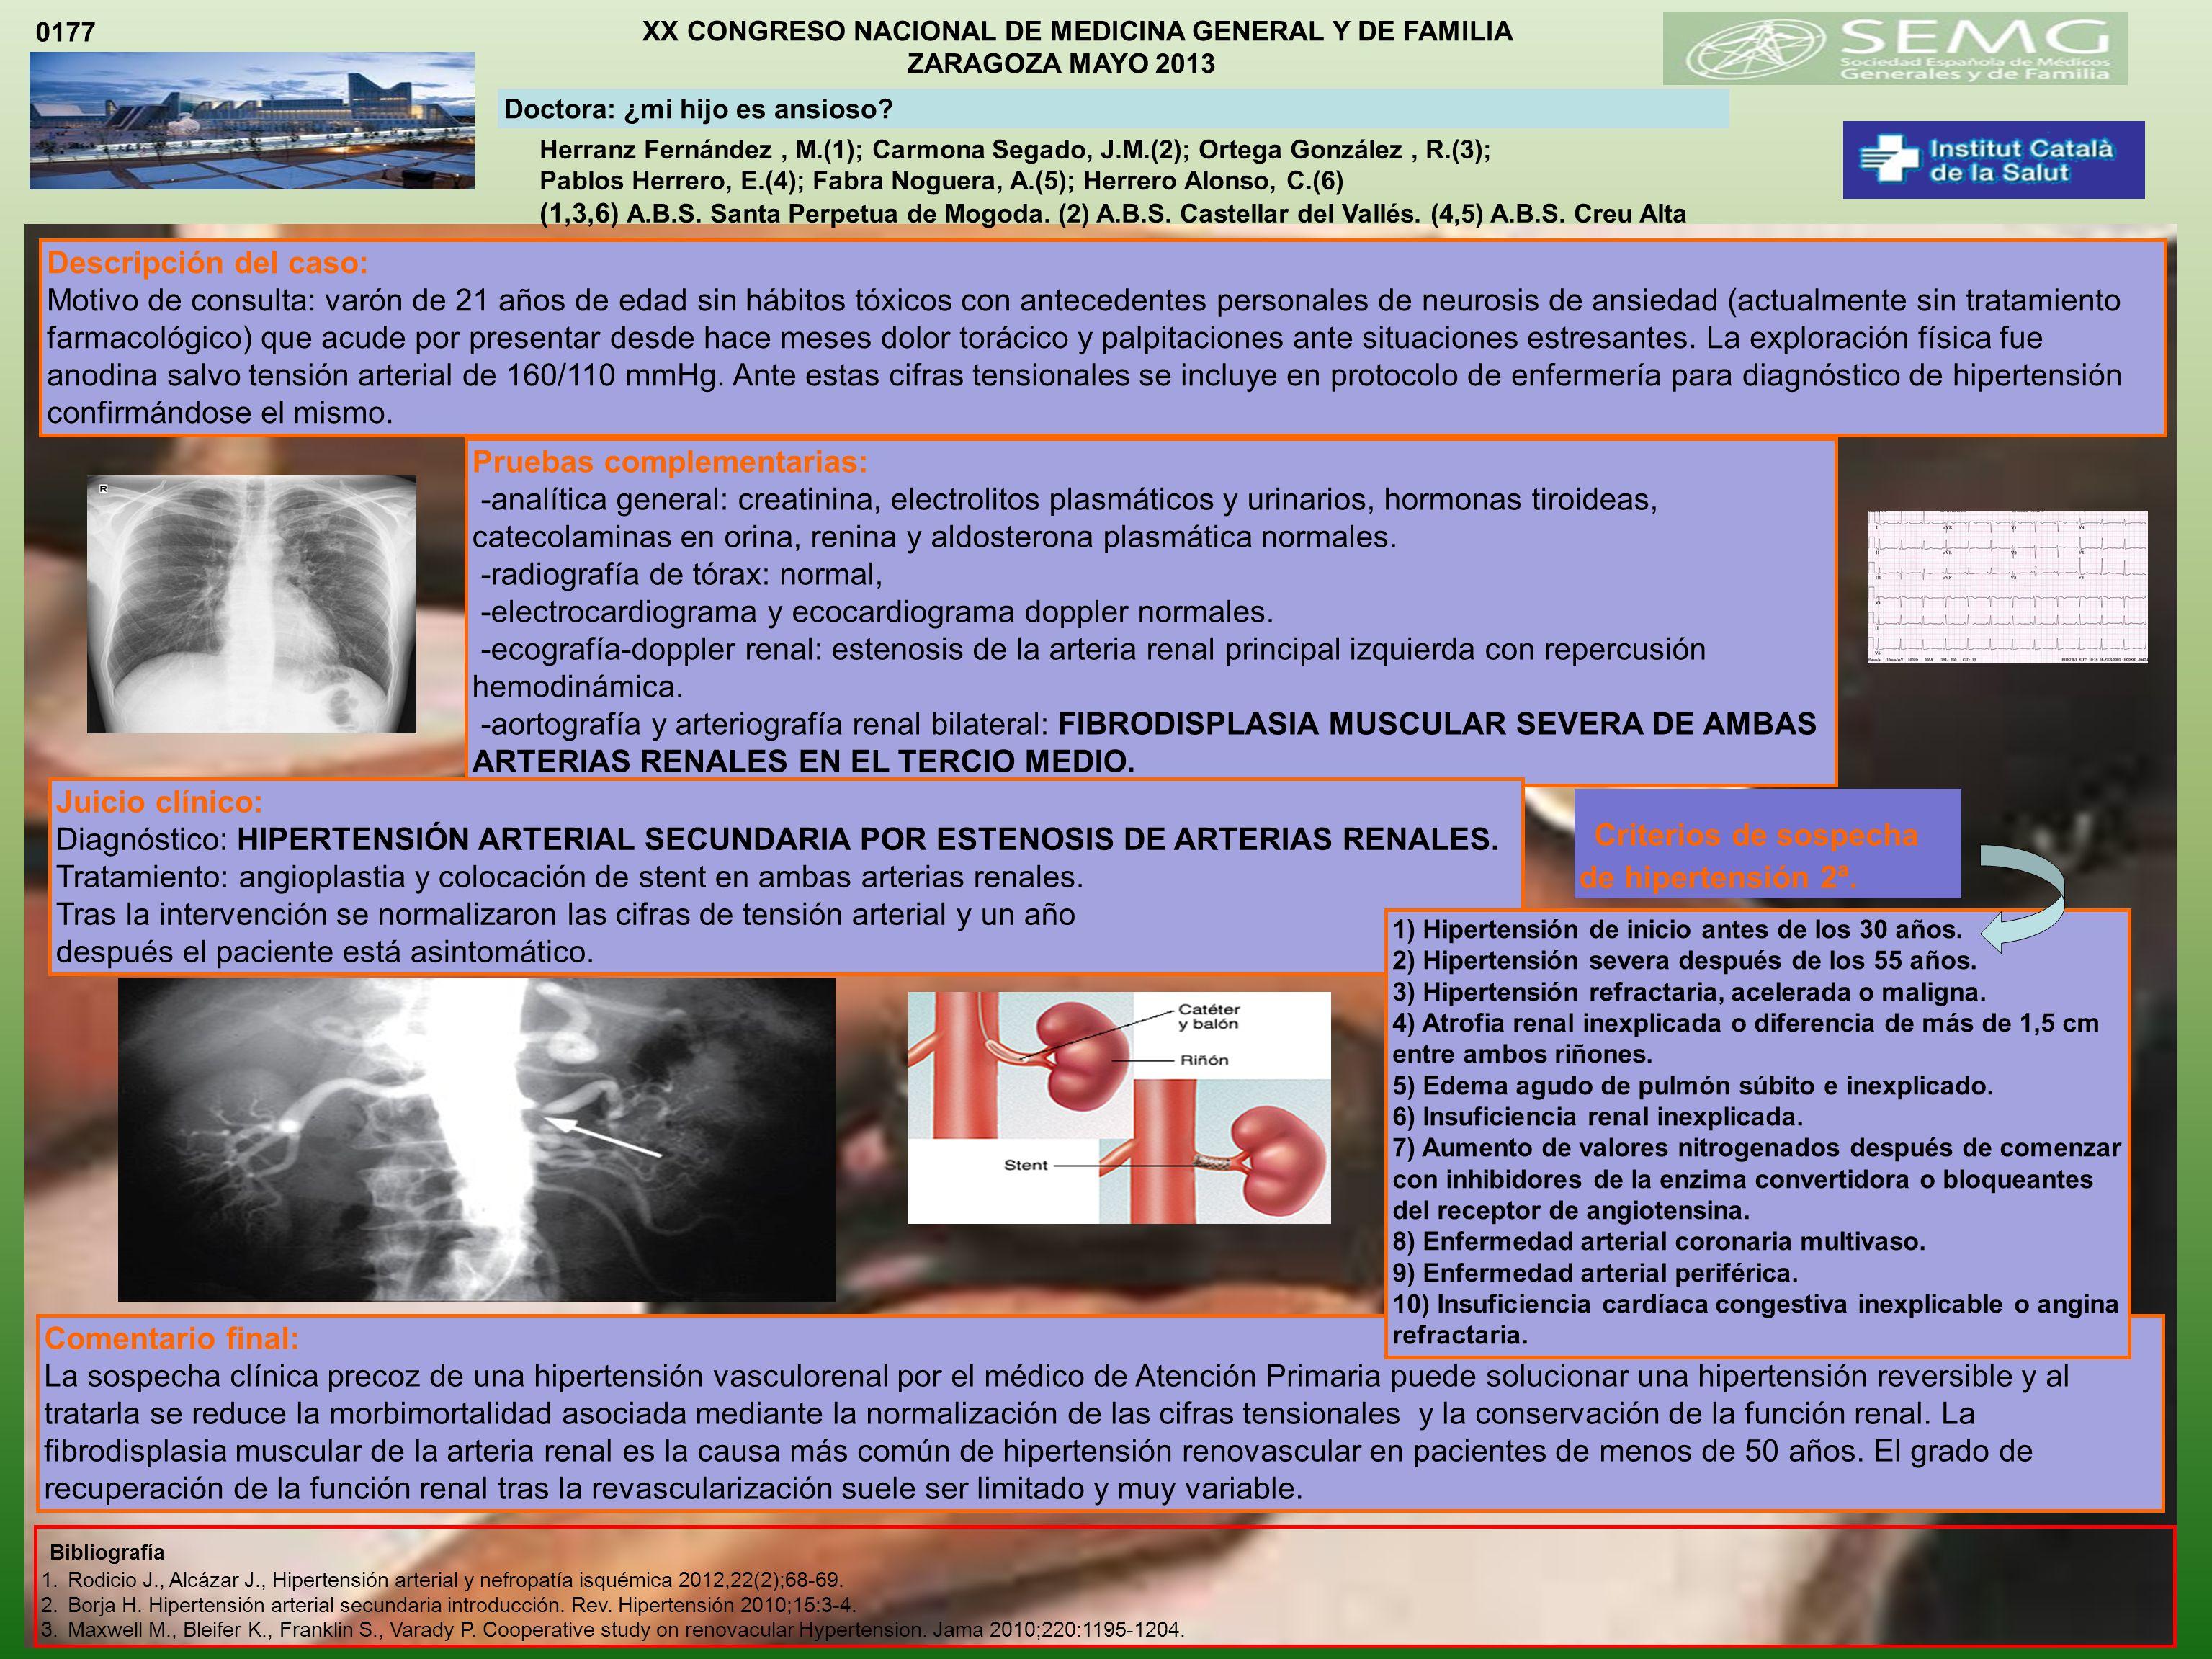 XX CONGRESO NACIONAL DE MEDICINA GENERAL Y DE FAMILIA ZARAGOZA MAYO 2013 Herranz Fernández, M.(1); Carmona Segado, J.M.(2); Ortega González, R.(3); Pablos Herrero, E.(4); Fabra Noguera, A.(5); Herrero Alonso, C.(6) (1,3,6) A.B.S.